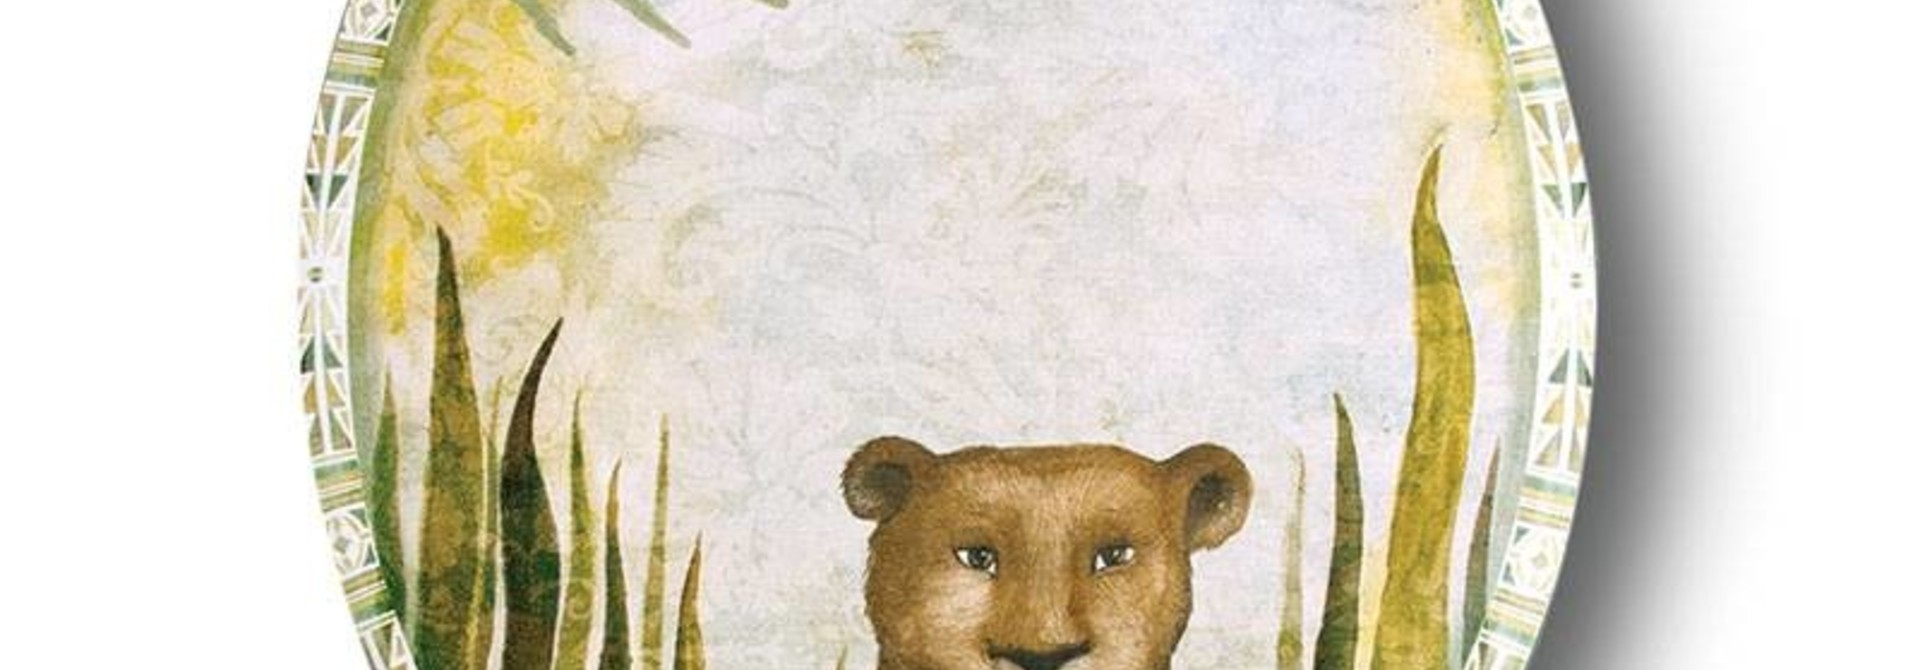 Lieber Löwe